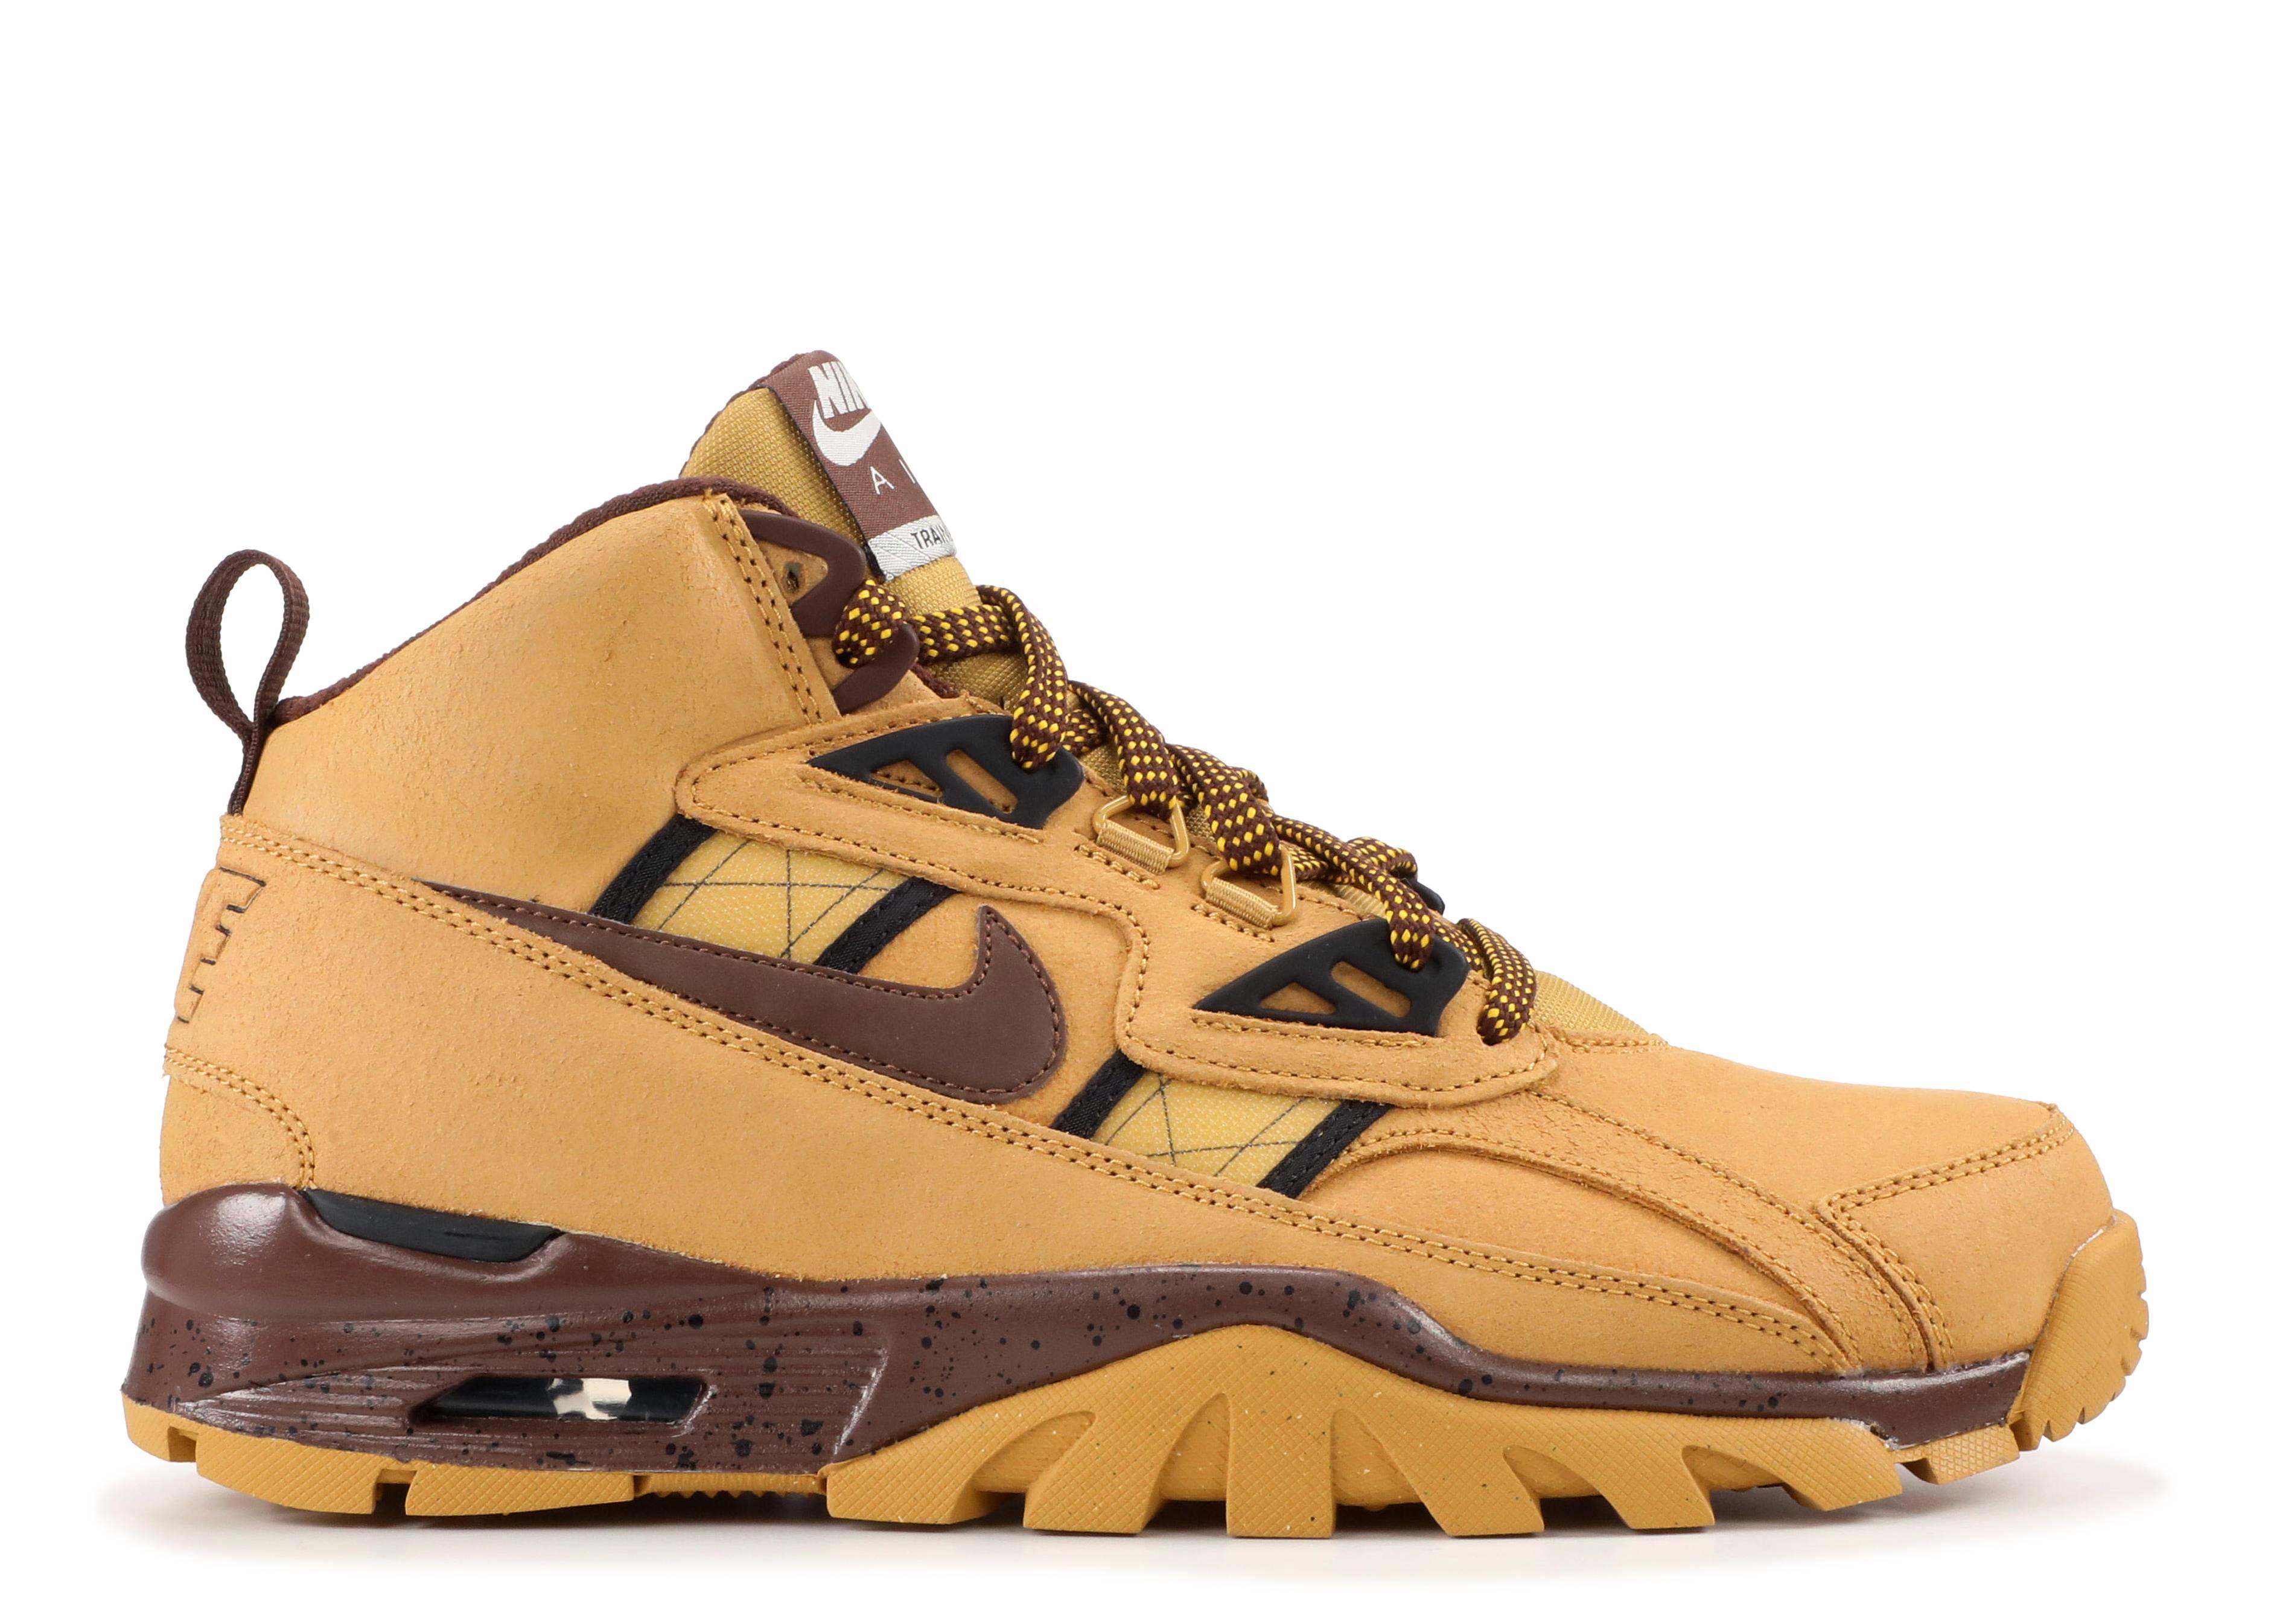 dab009508e4 Air Trainer Sc SneakerBoot - Nike - 684713 700 - haystack lt chocolate-black